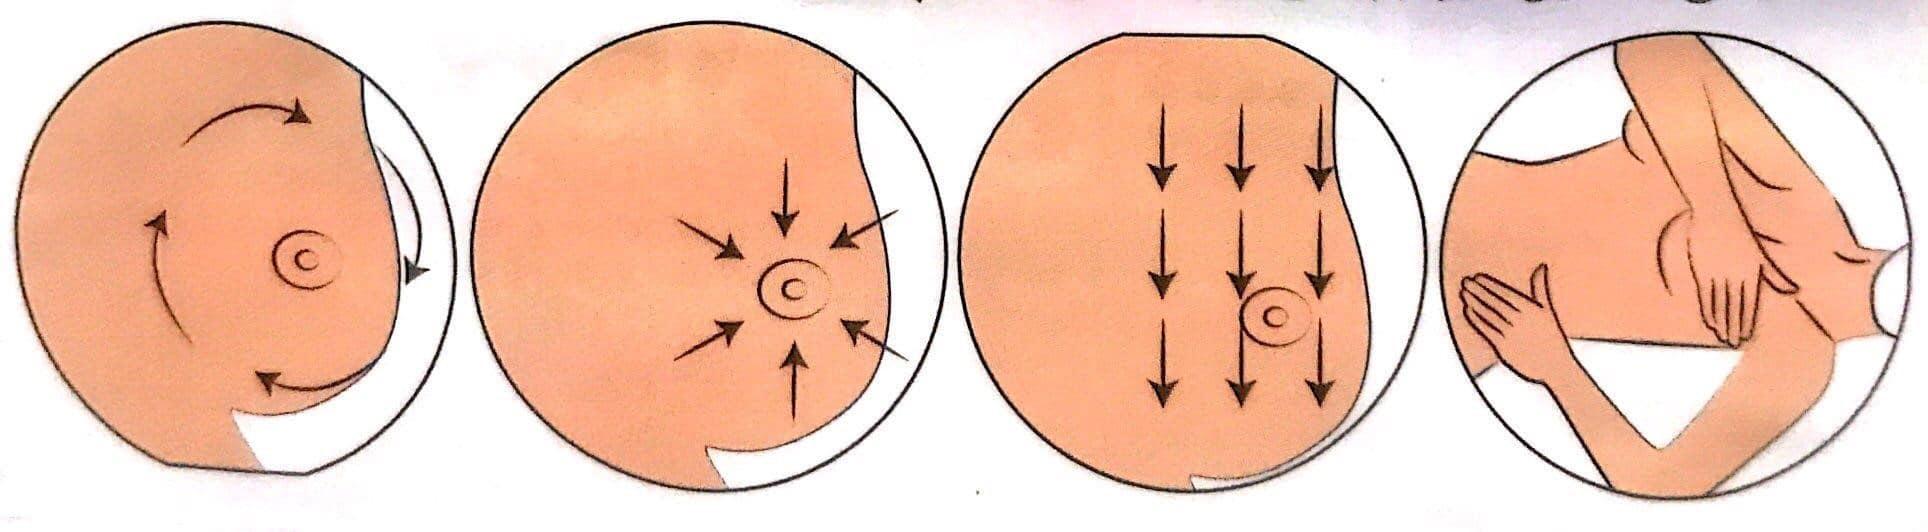 خودآزمایی پستان (معاینه فردی پستان)